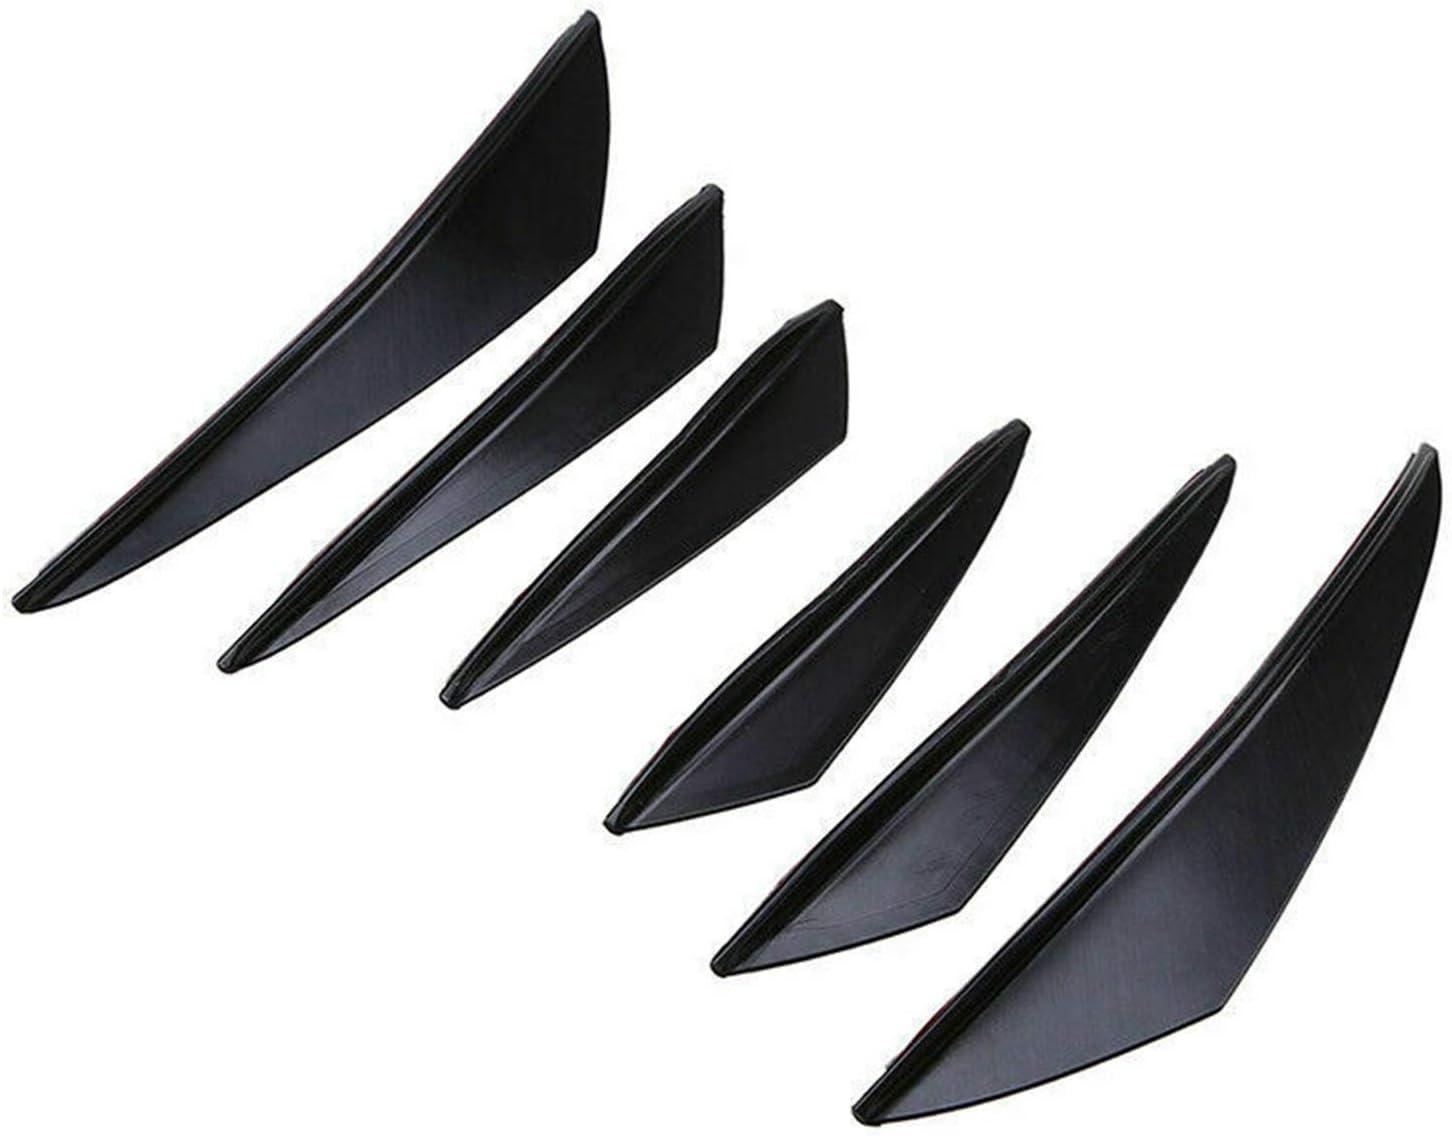 Areyourshop 6 pz universale in fibra di carbonio PP auto paraurti anteriore alettoni canards refit